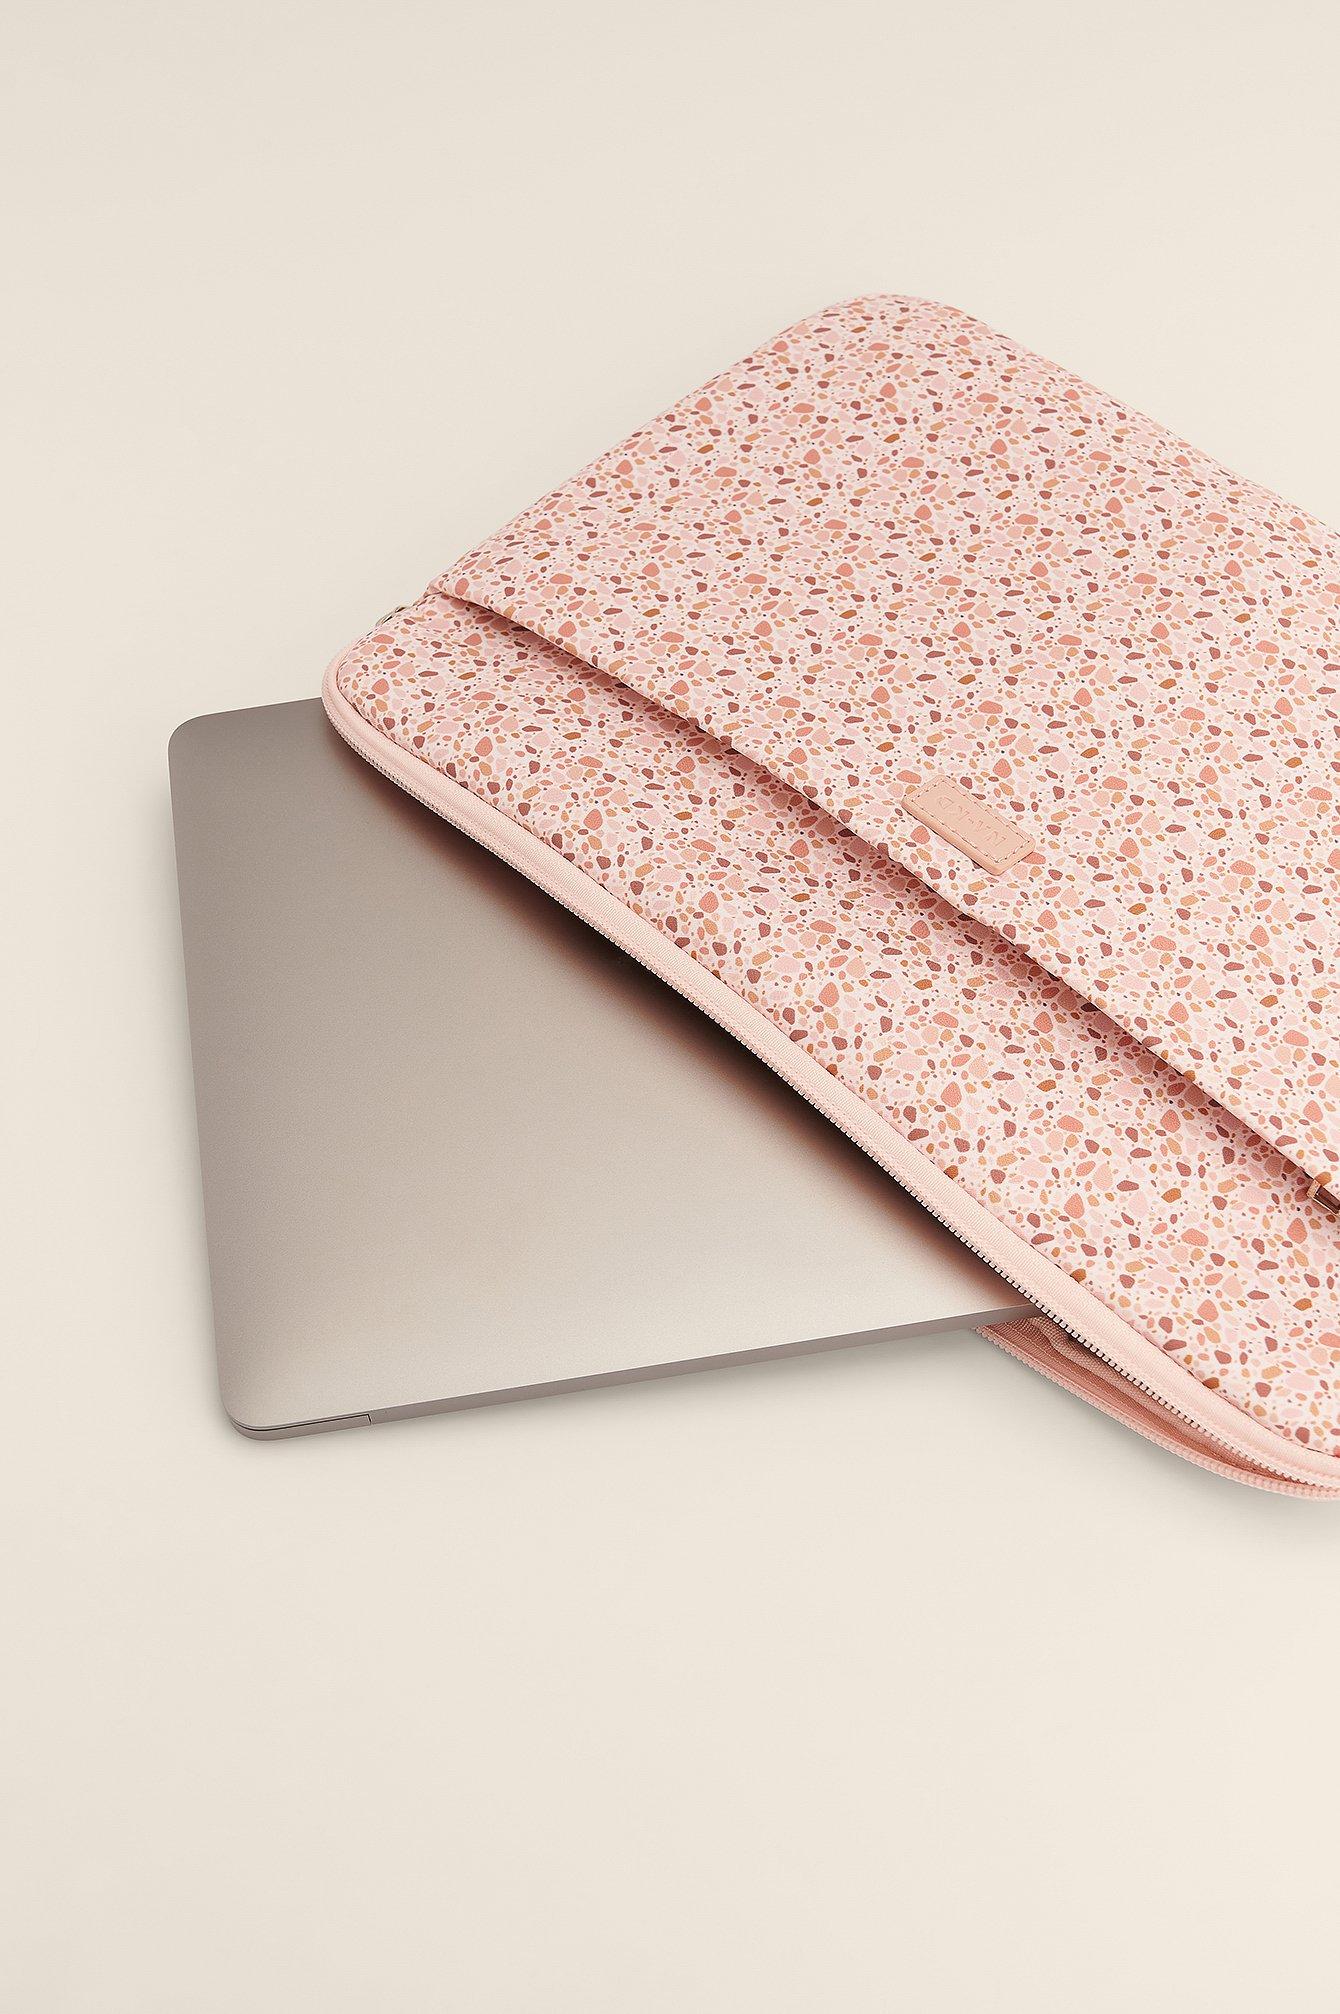 na-kd accessories -  Bedruckte Laptop-Schutzhülle - Multicolor